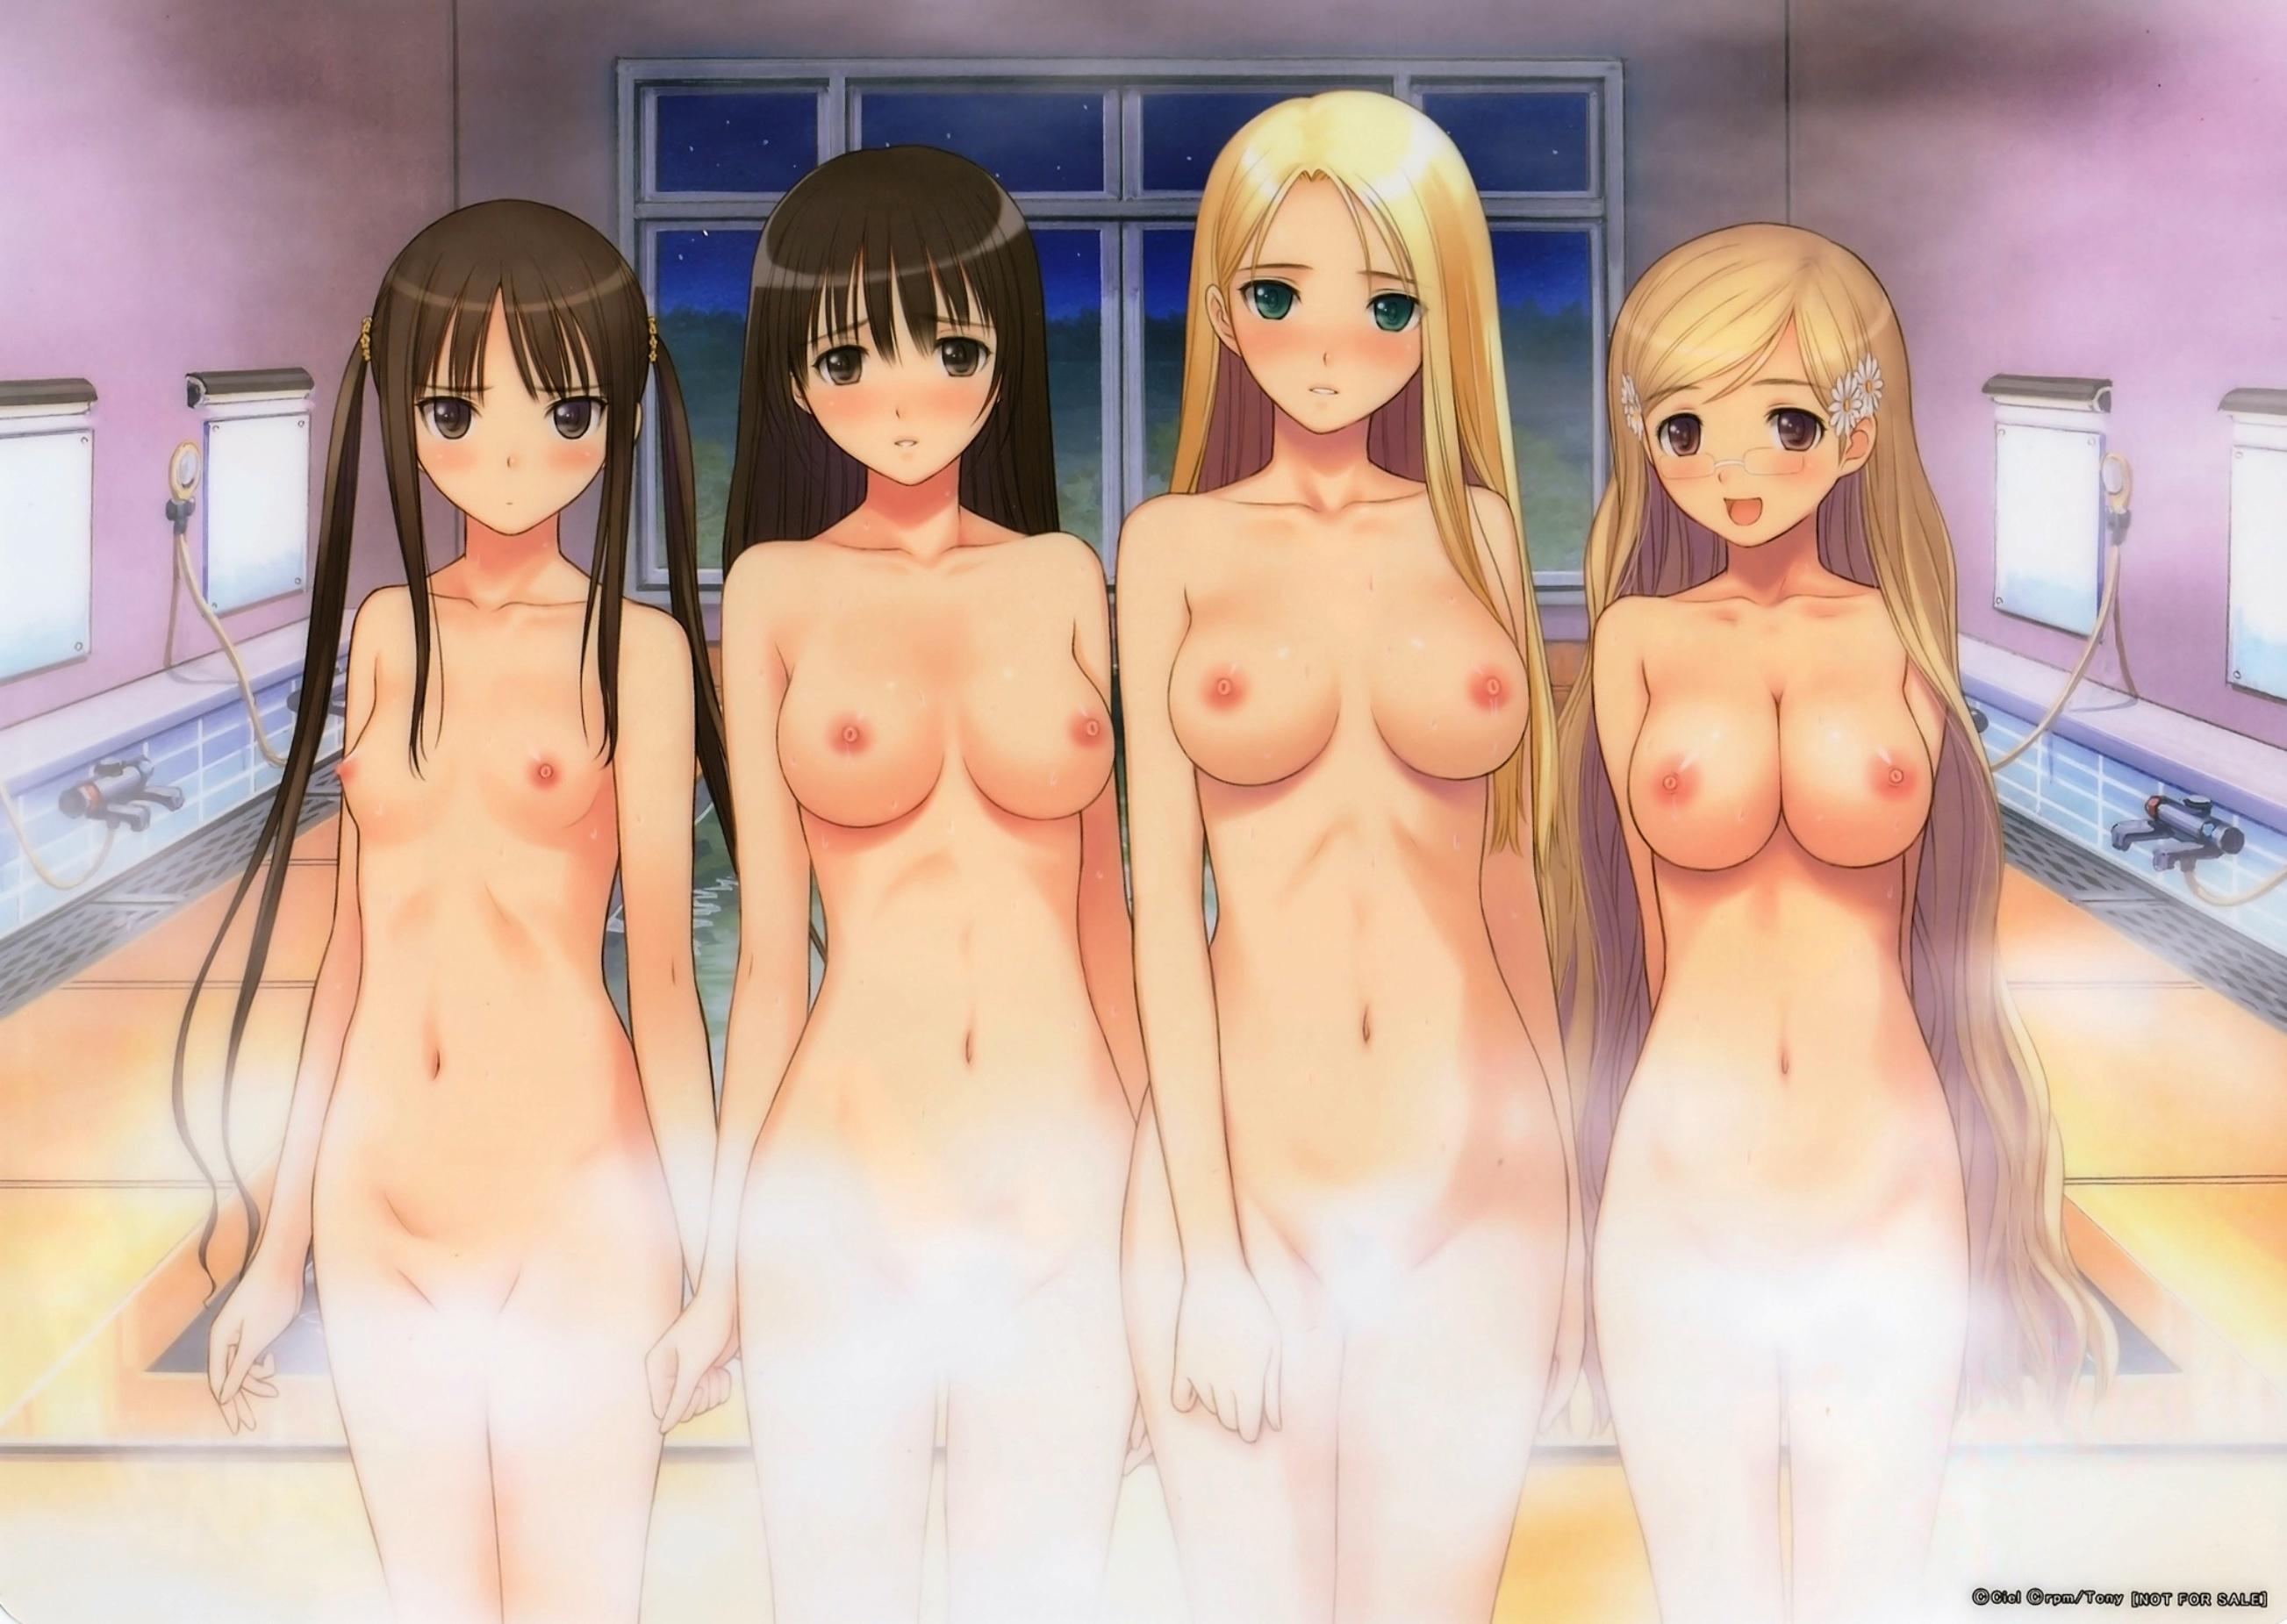 Anime babe nude gd pics erotic photos